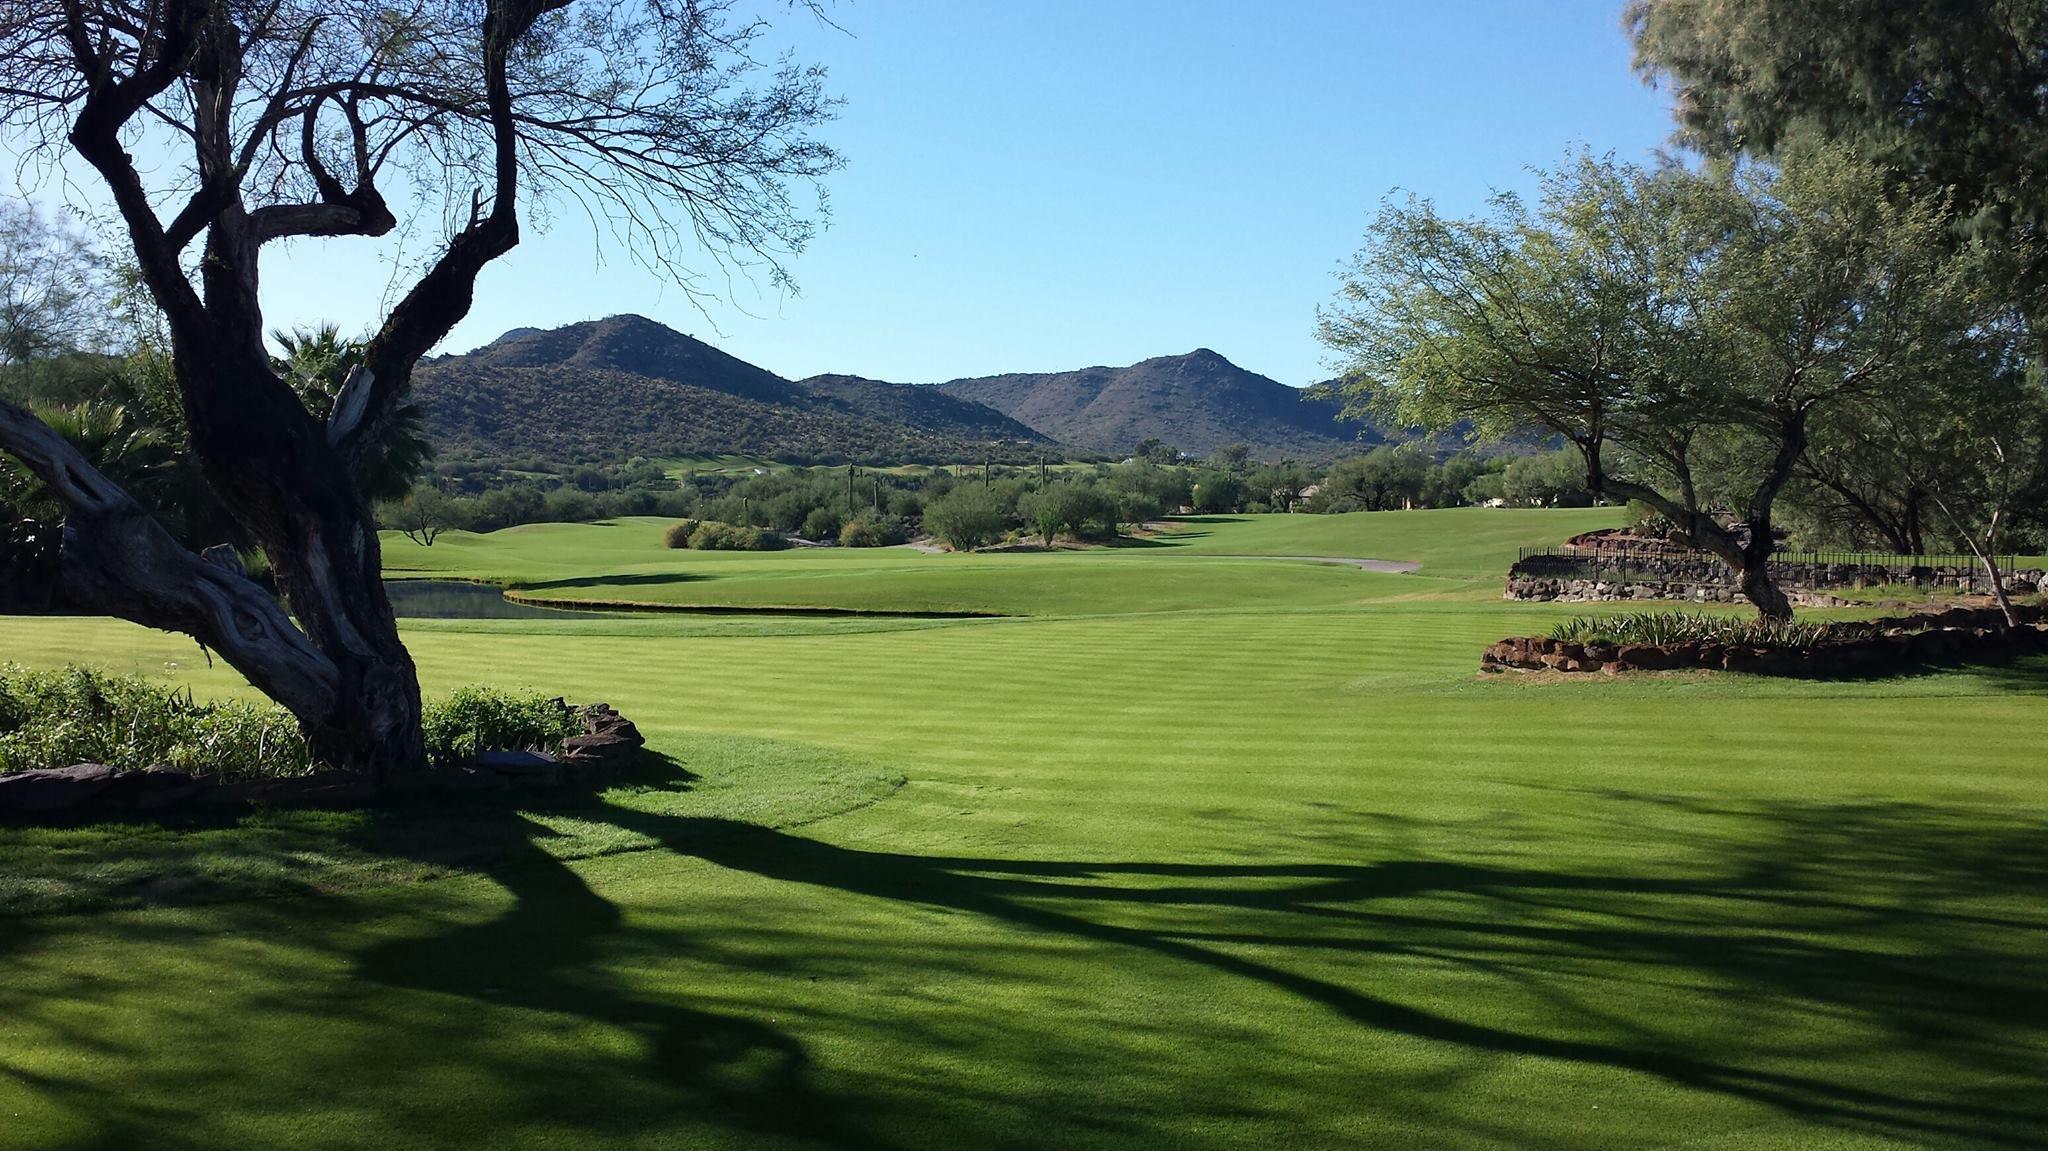 rancho manana golf club golf course all square golf. Black Bedroom Furniture Sets. Home Design Ideas